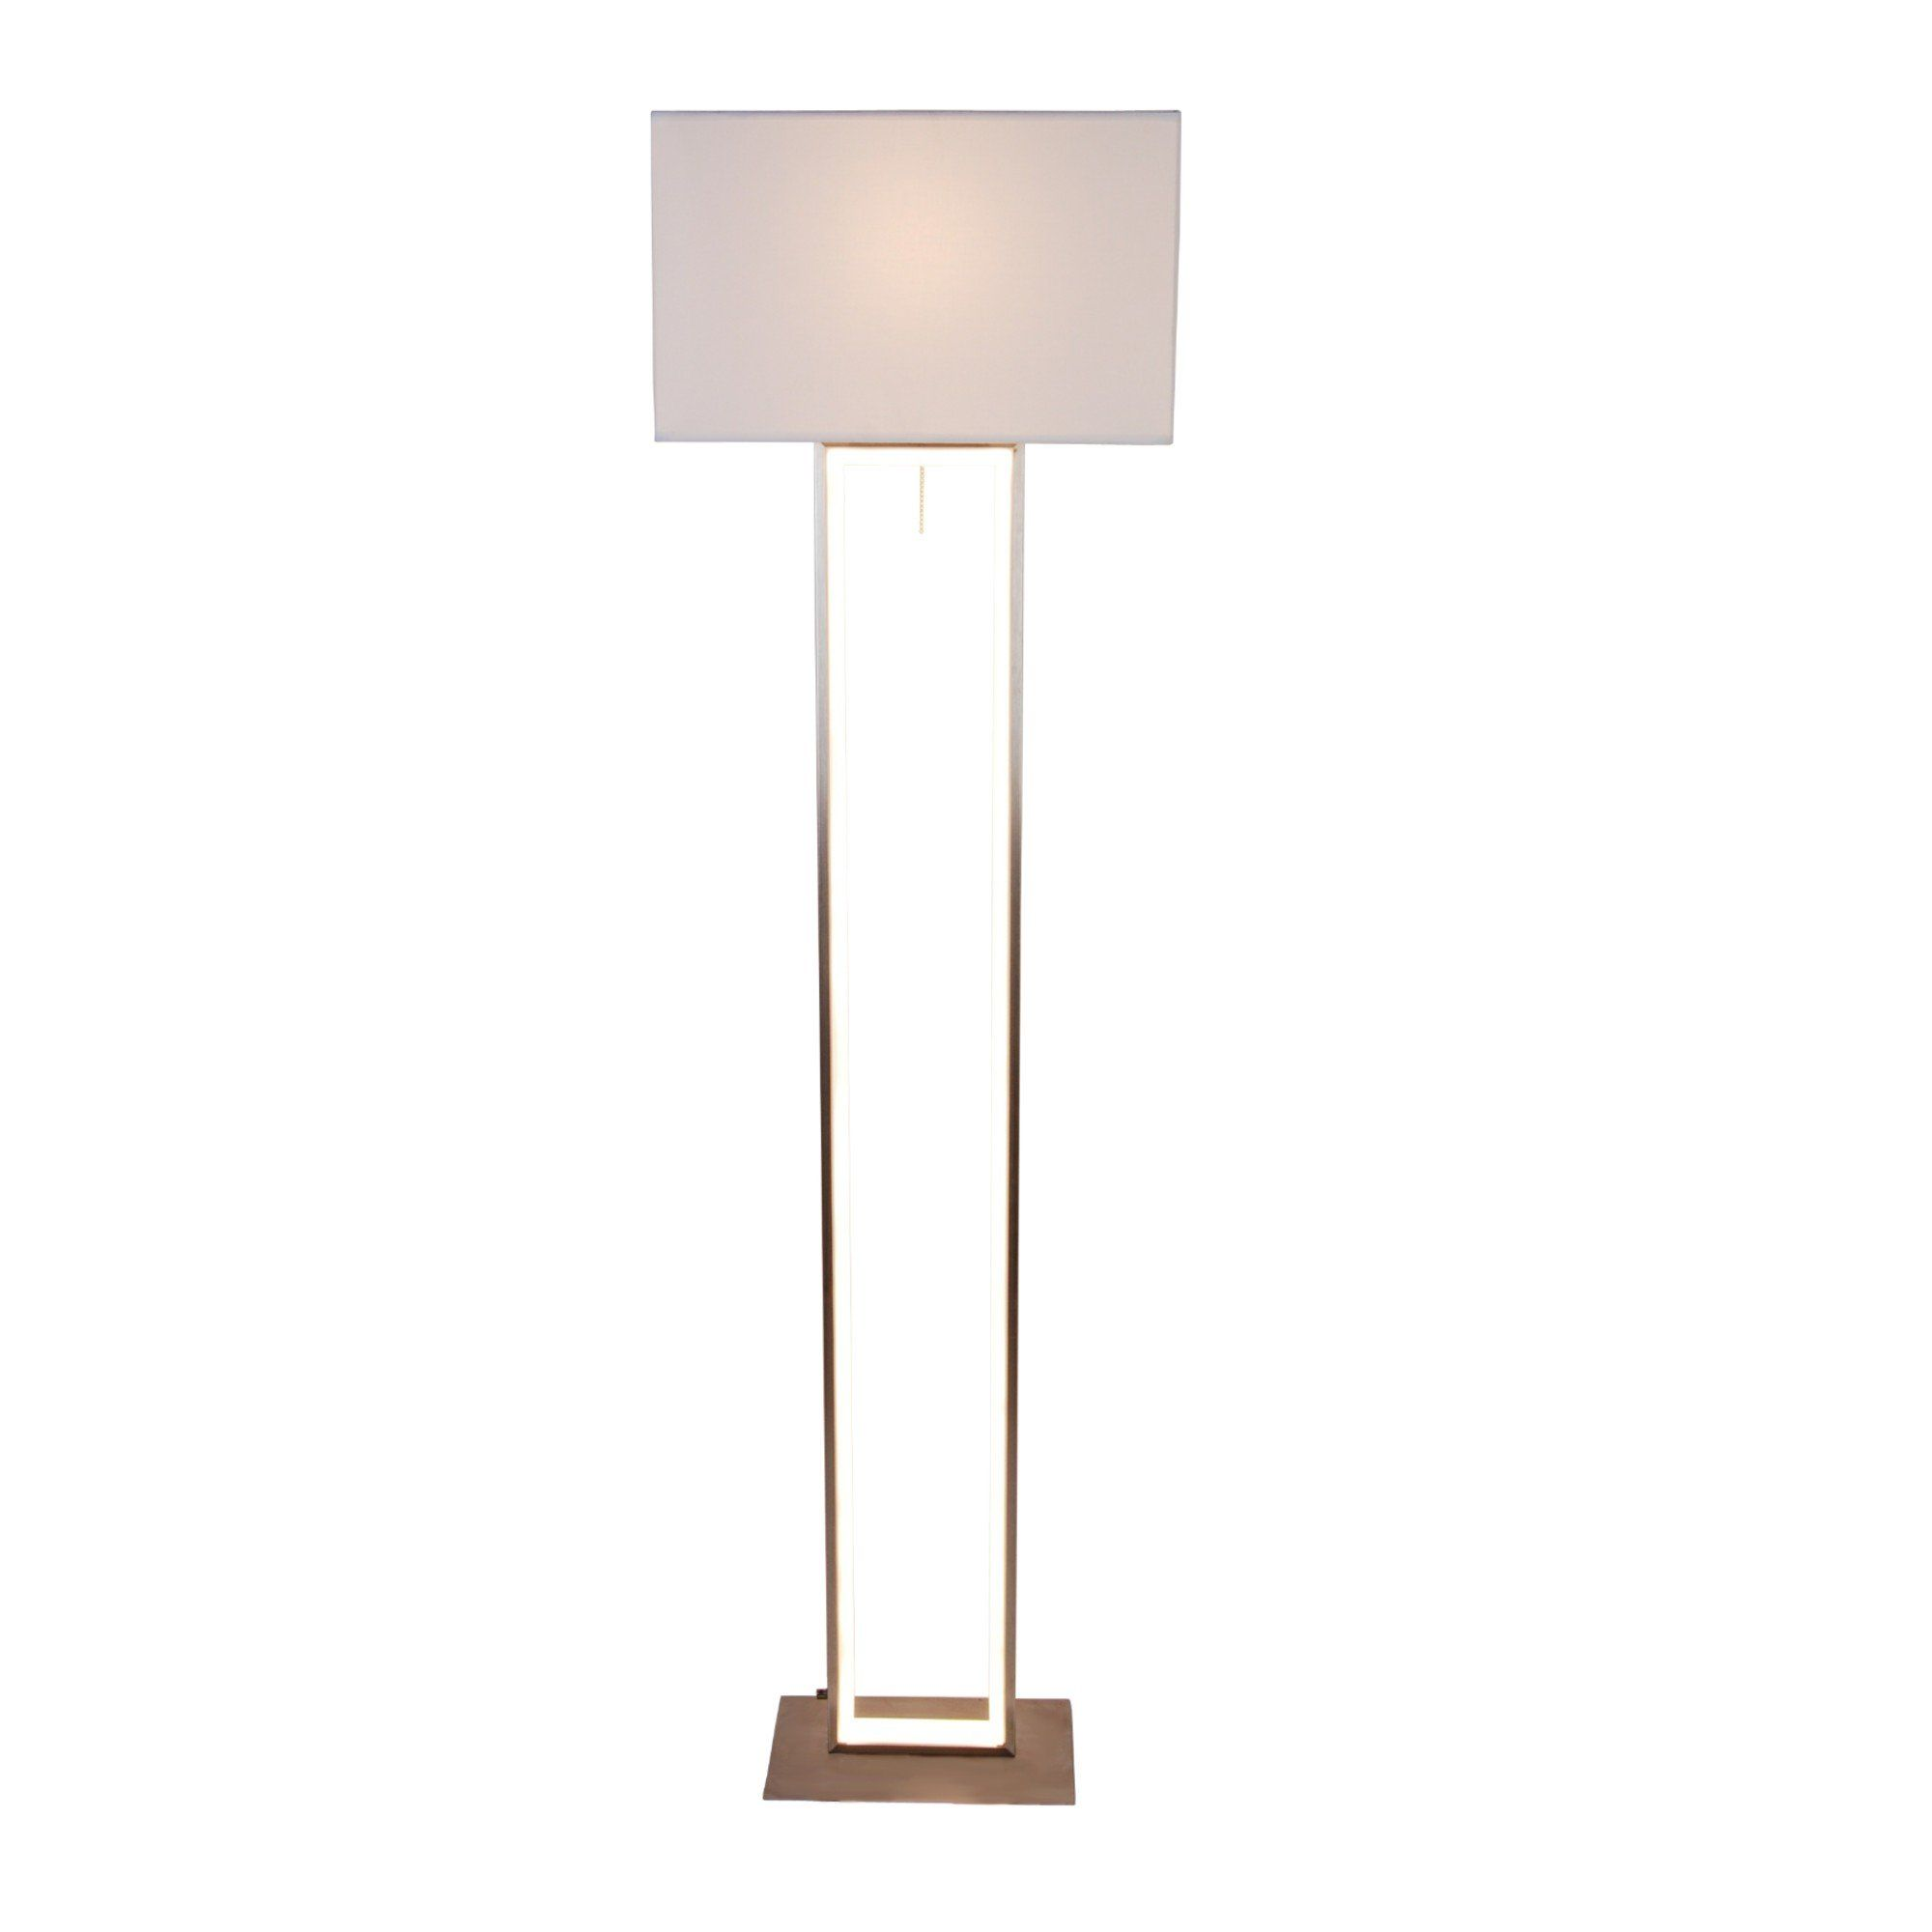 Ulari Warm White LED 150cm Satin Nickel Floor Lamp